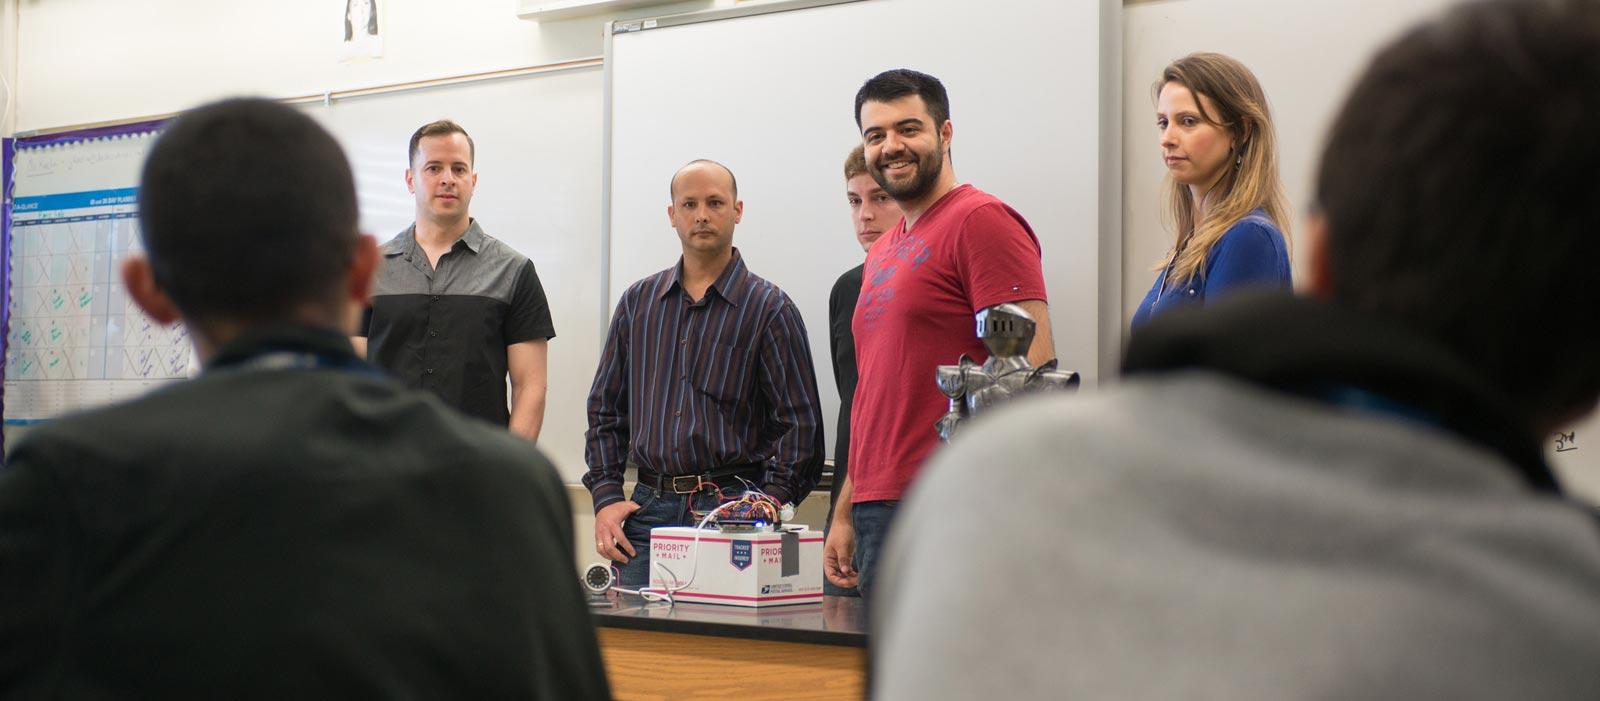 fiu-college-engineering-Engineering-students-inspire-high-schoolers-1600